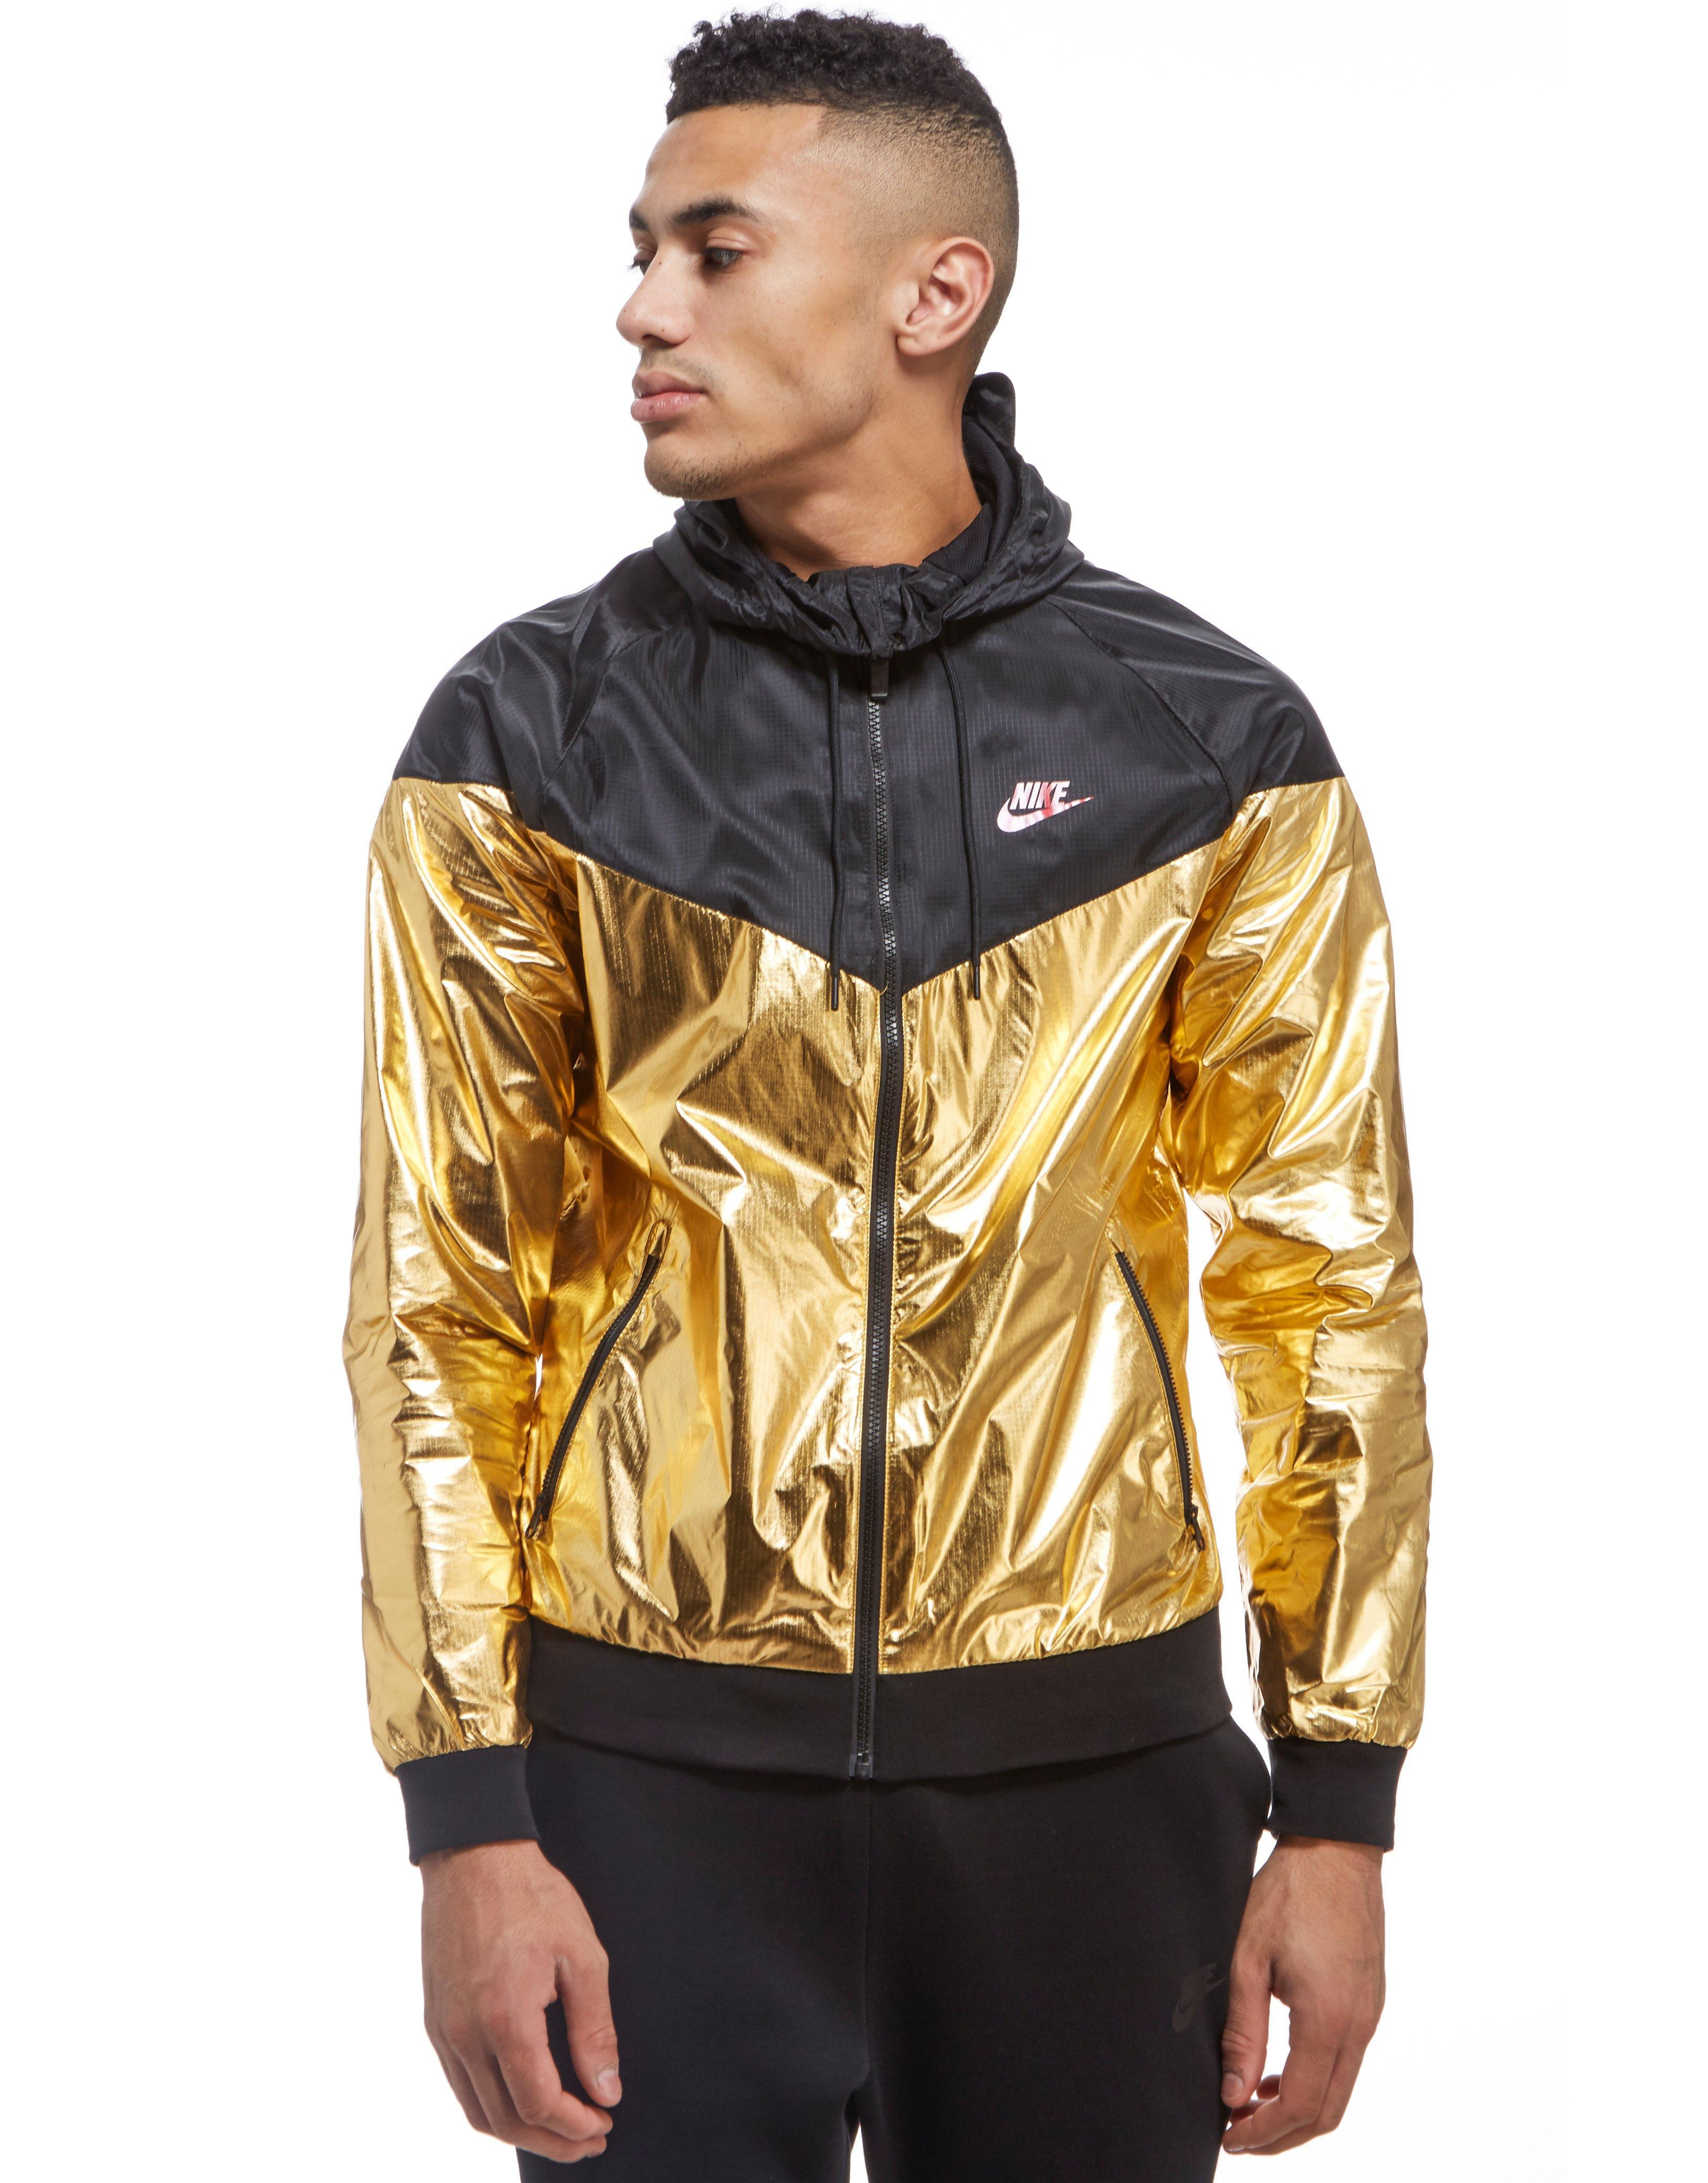 37f19f9486bd ... Sportswear Windrunner Mens Jacket Nike. Mens Metallic Windrunner Foil  Jacket ...